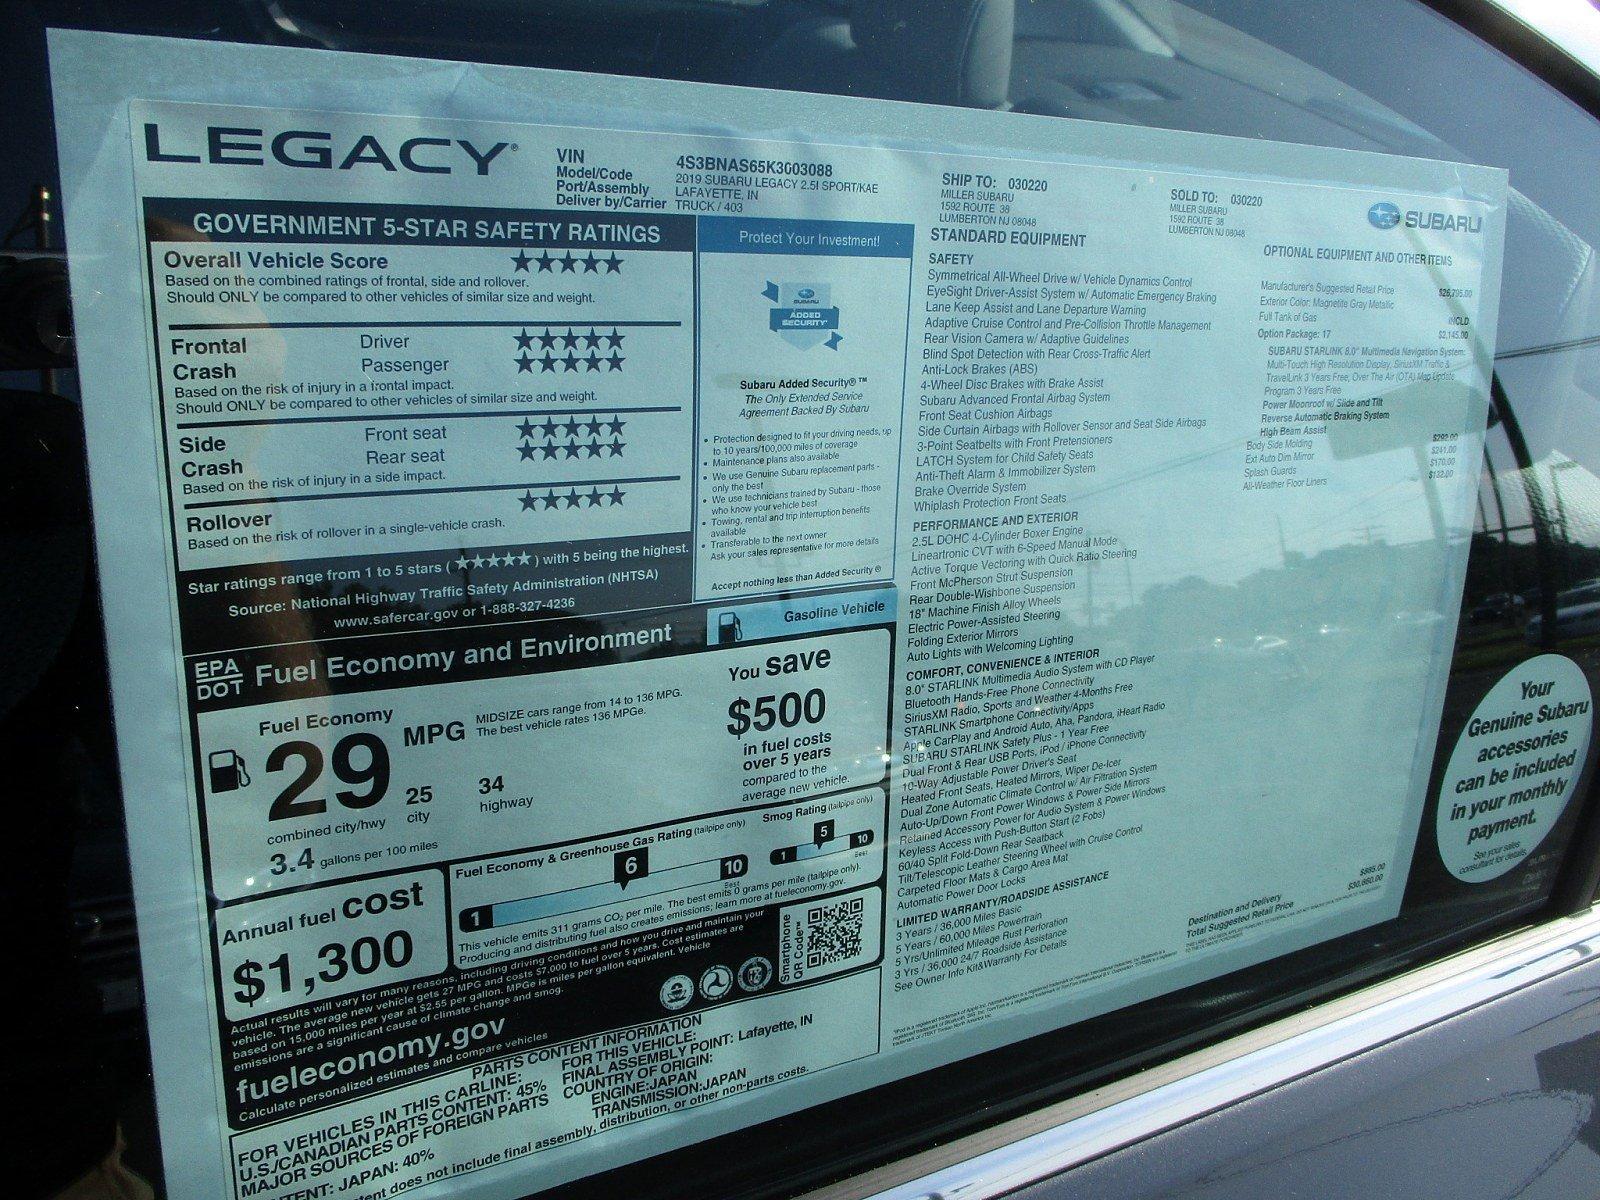 New 2019 Subaru Legacy 2 5i Sport For Sale or Lease Near Mt Holly NJ